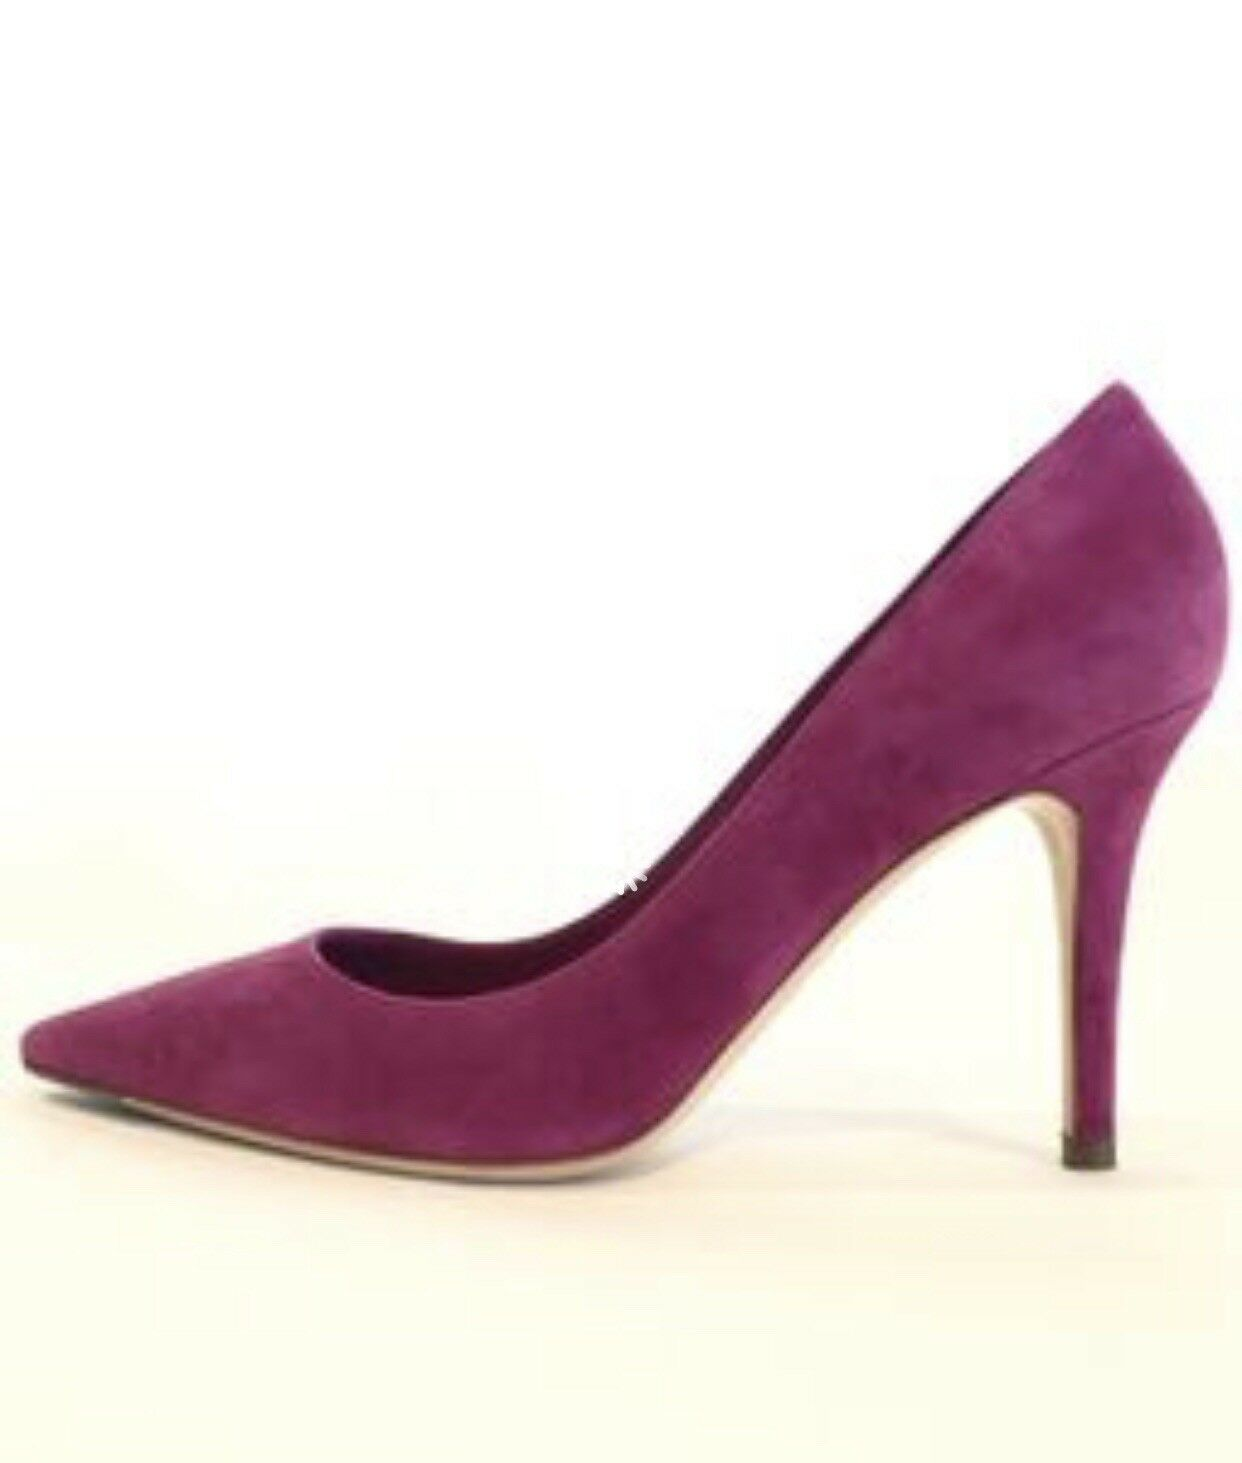 NEW In Box Ralph Lauren Collection Elsina Dark Dark Dark Pink Fuchsia Suede Heels Sz 10 0fd4be